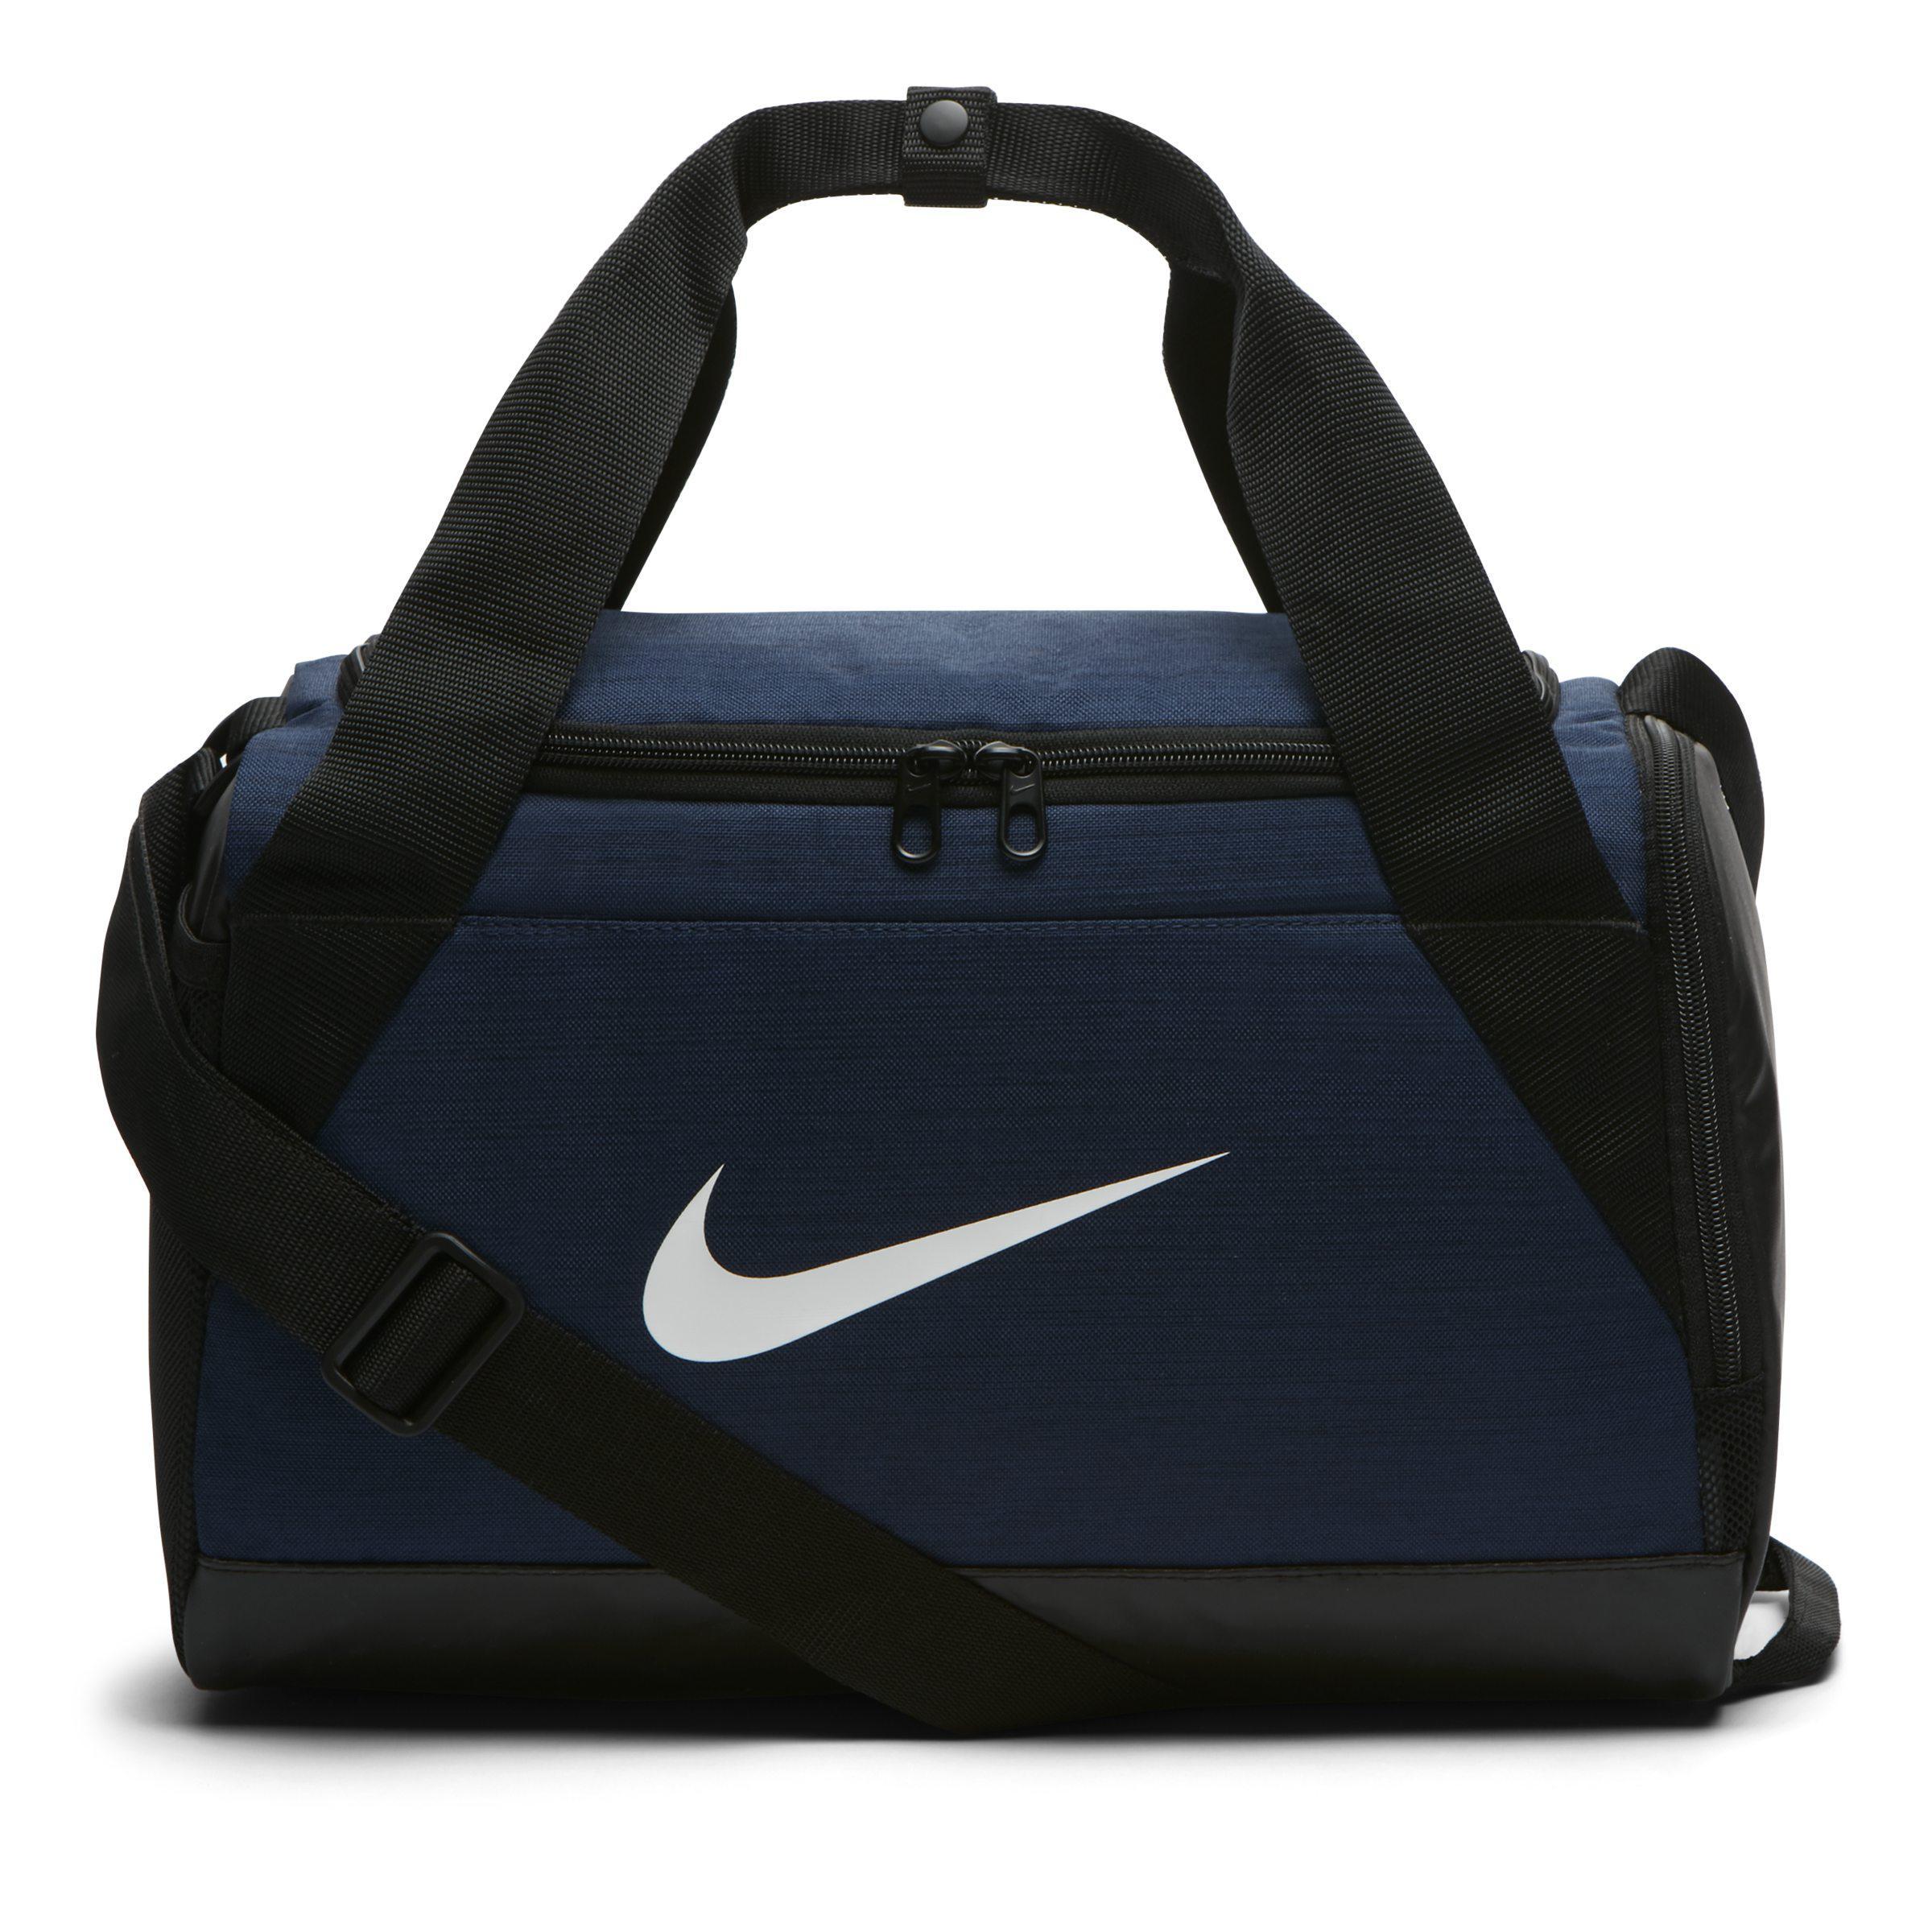 2c071e32b0e0 Nike Brasilia (extra Small) Training Duffel Bag in Blue - Lyst